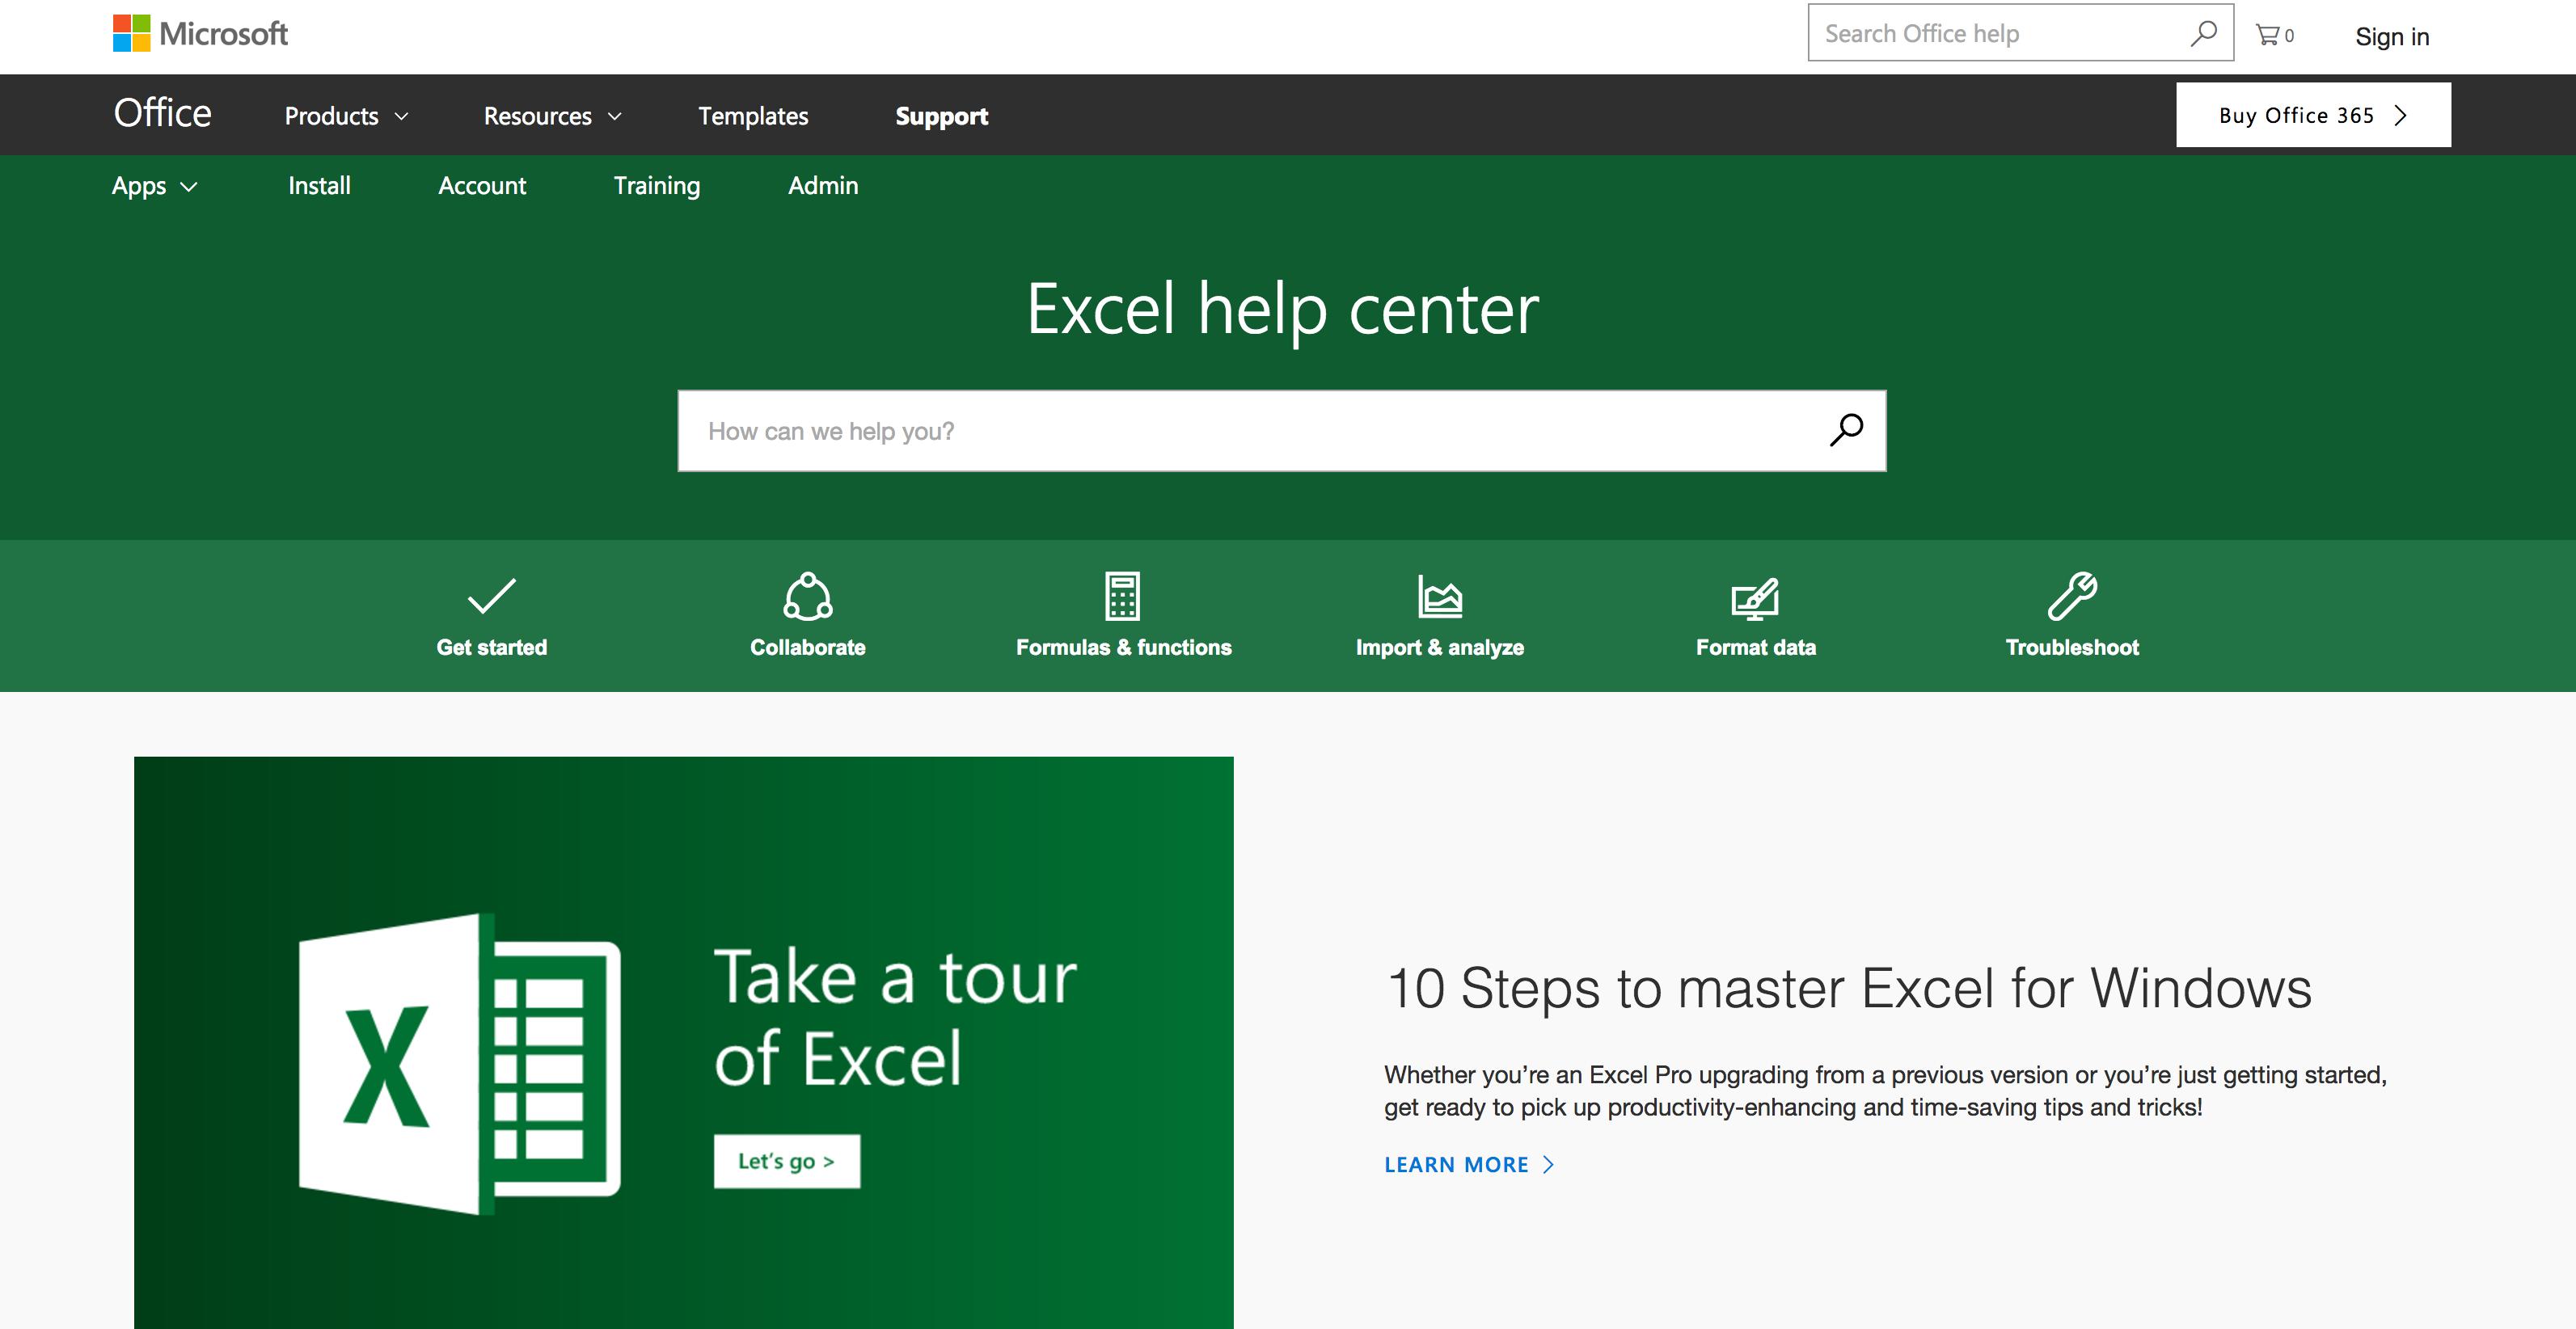 Microsoft knowledge base